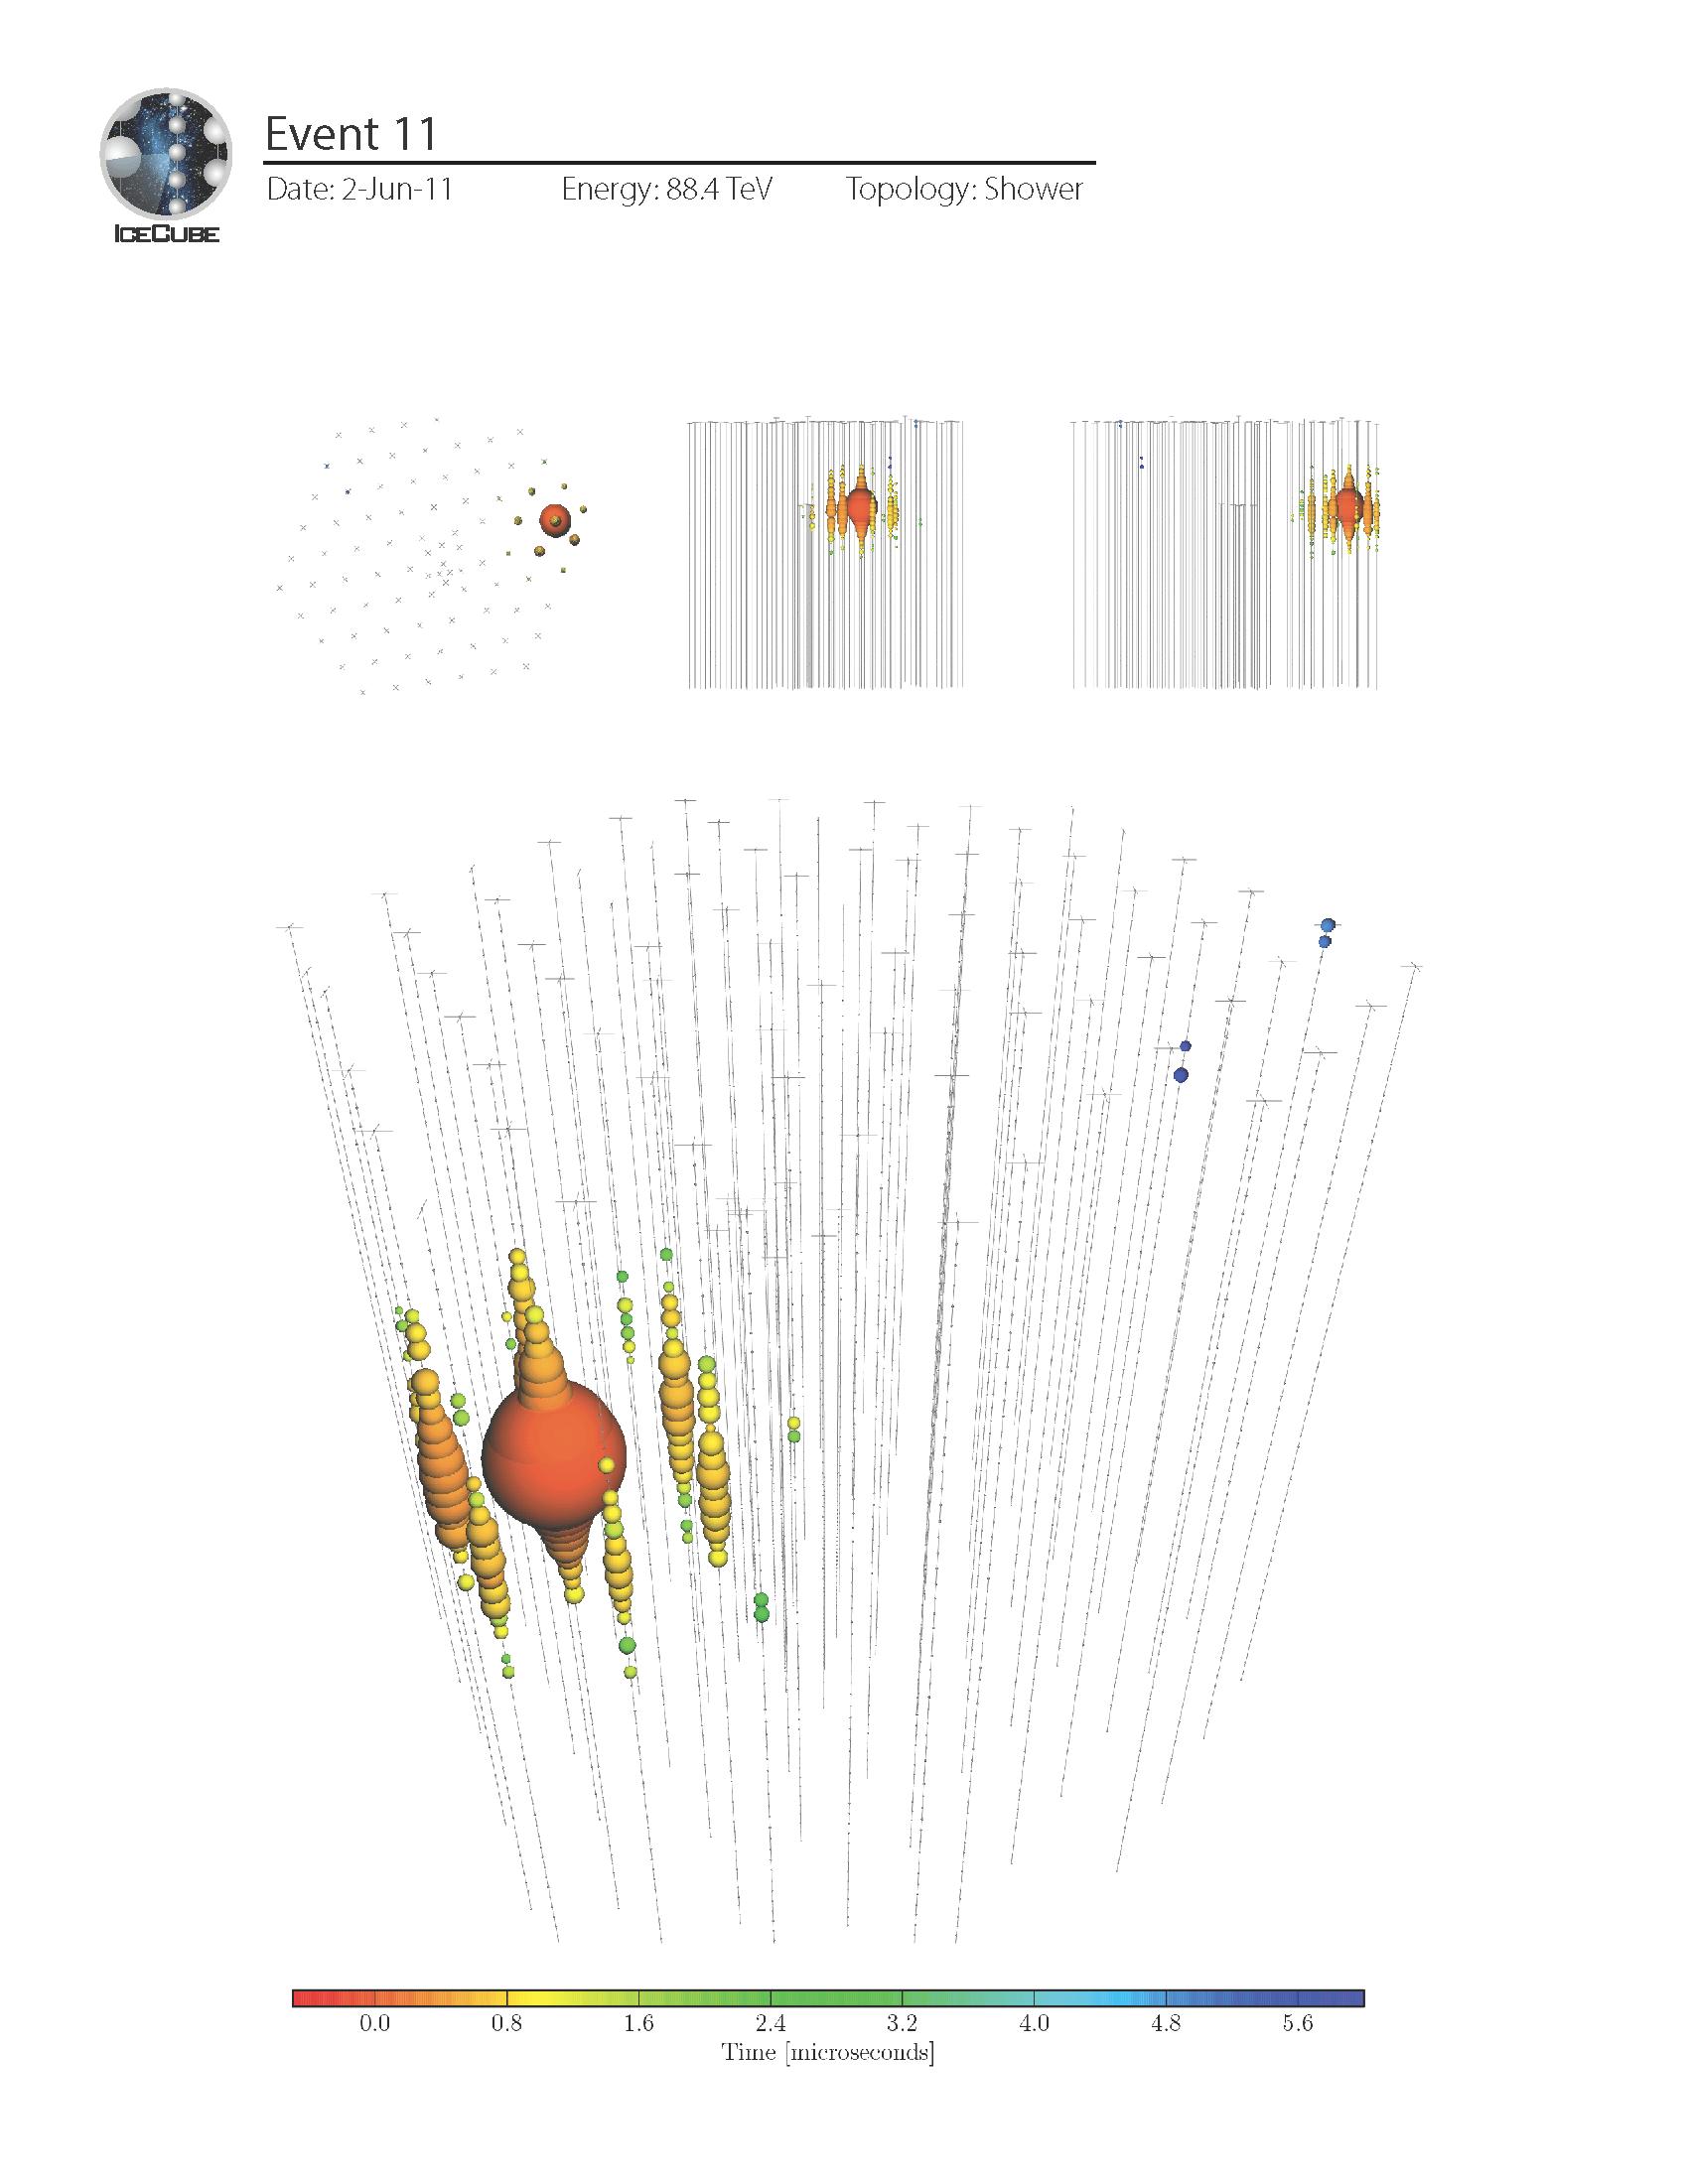 Event 11: 88.4 TeV, June 2, 2011